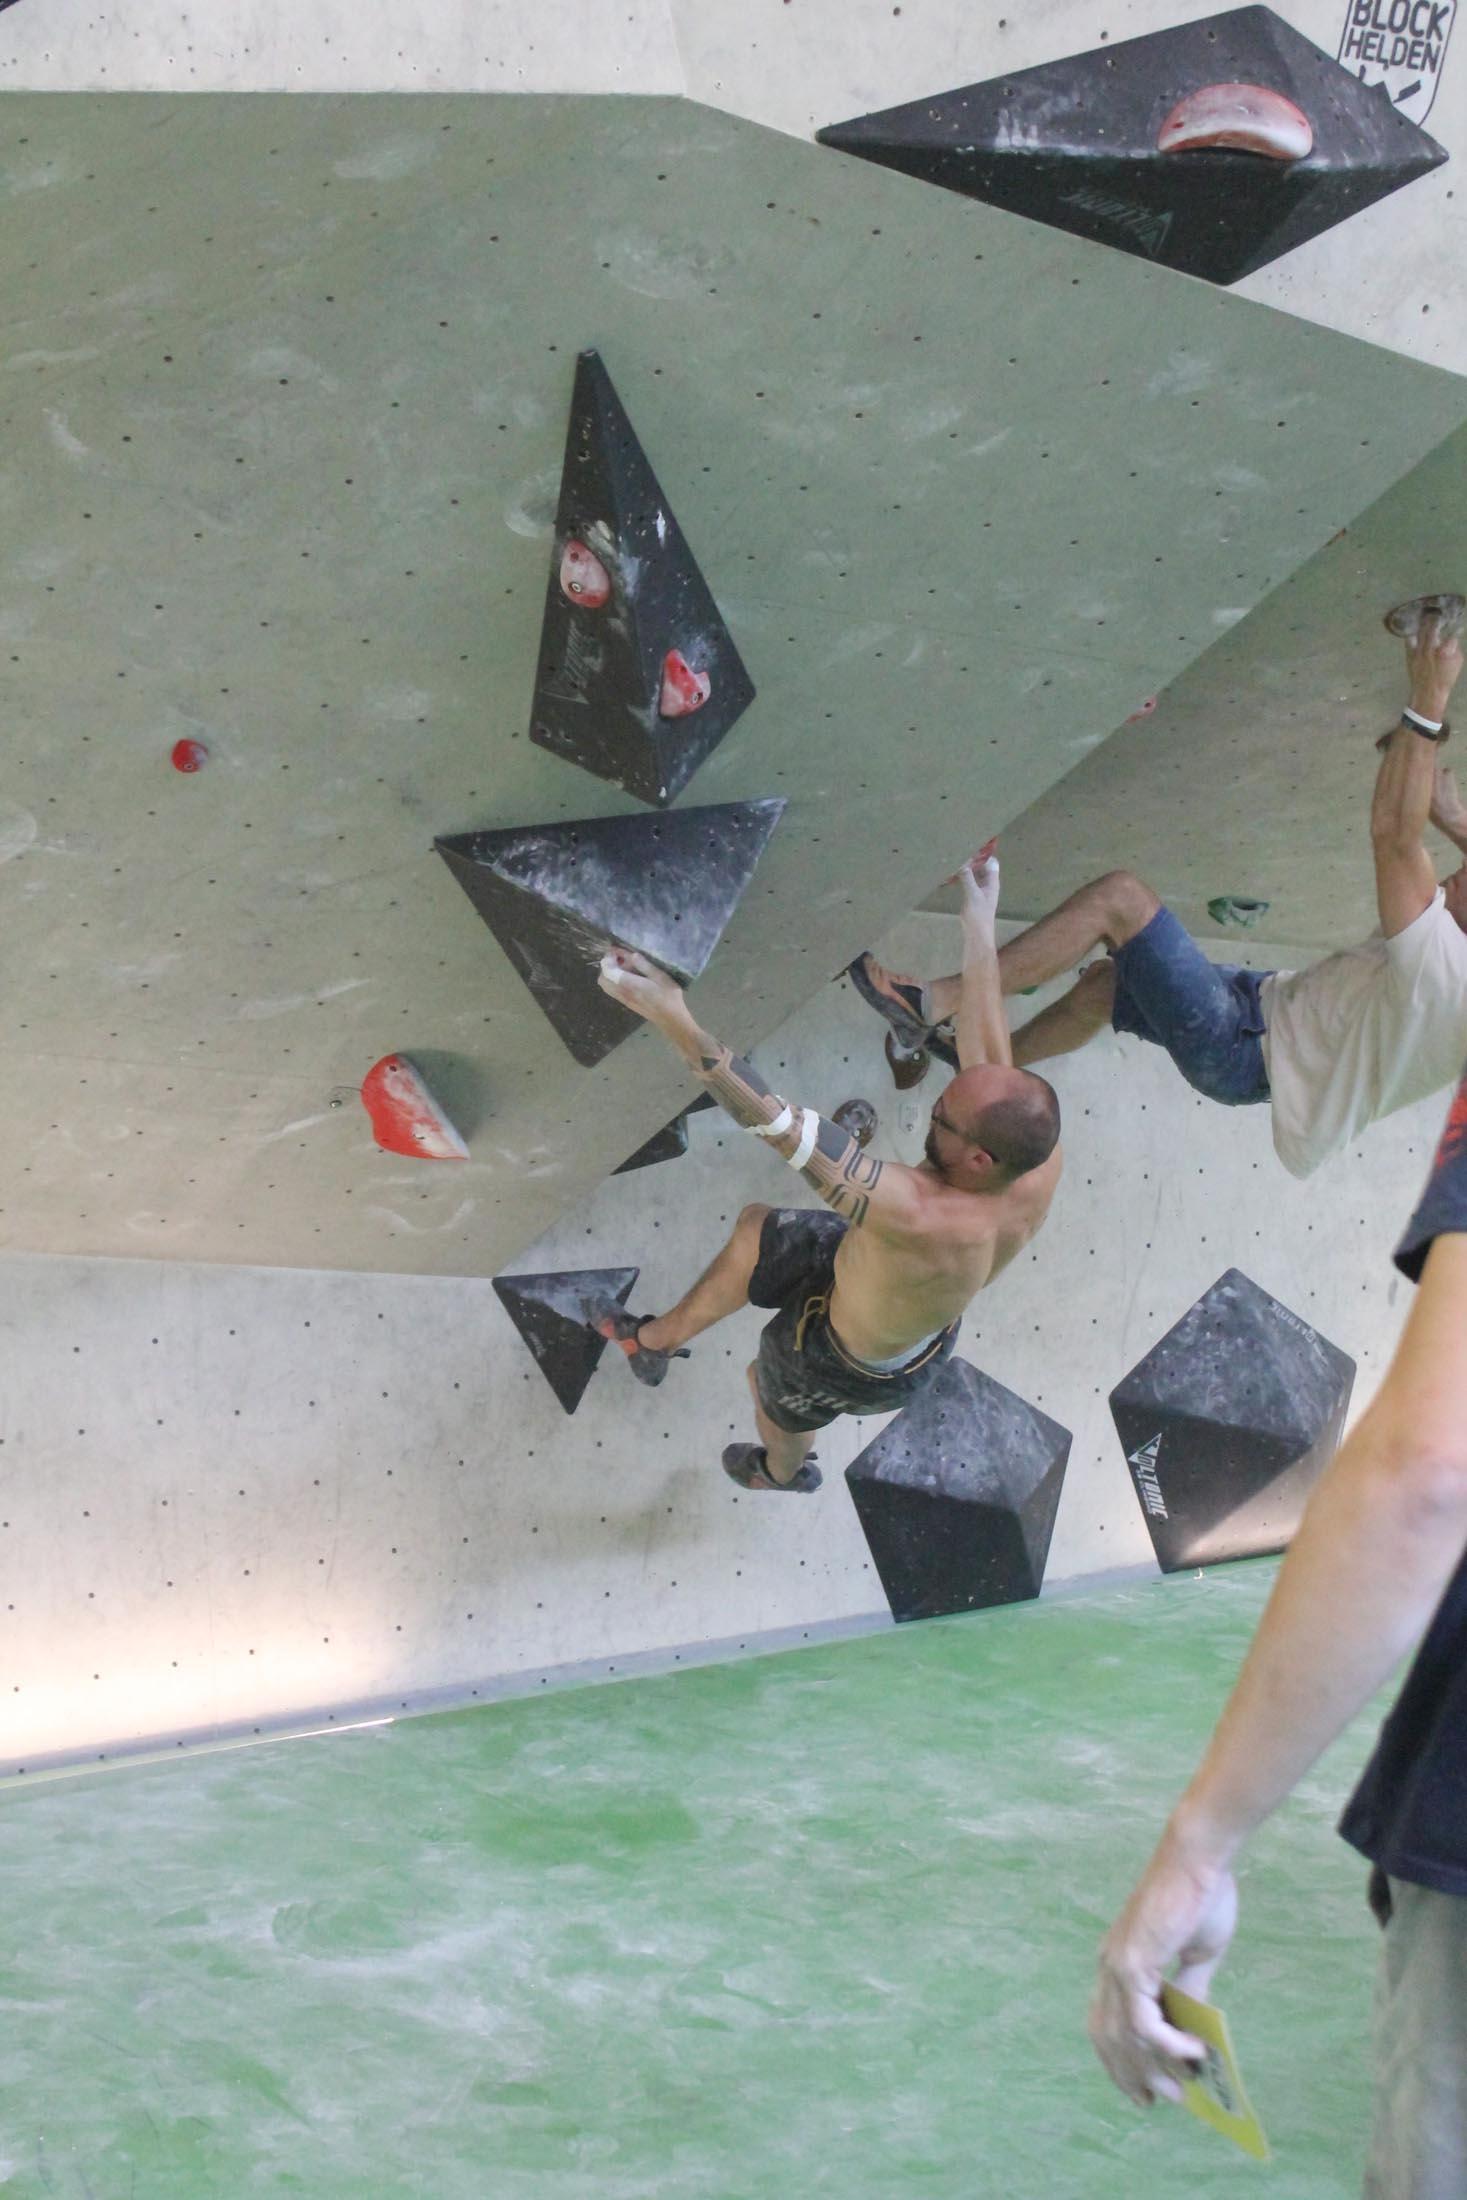 Quali, internationaler bouldercup Frankenjura 2016, BLOCKHELDEN Erlangen, Mammut, Bergfreunde.de, Boulderwettkampf07092016266